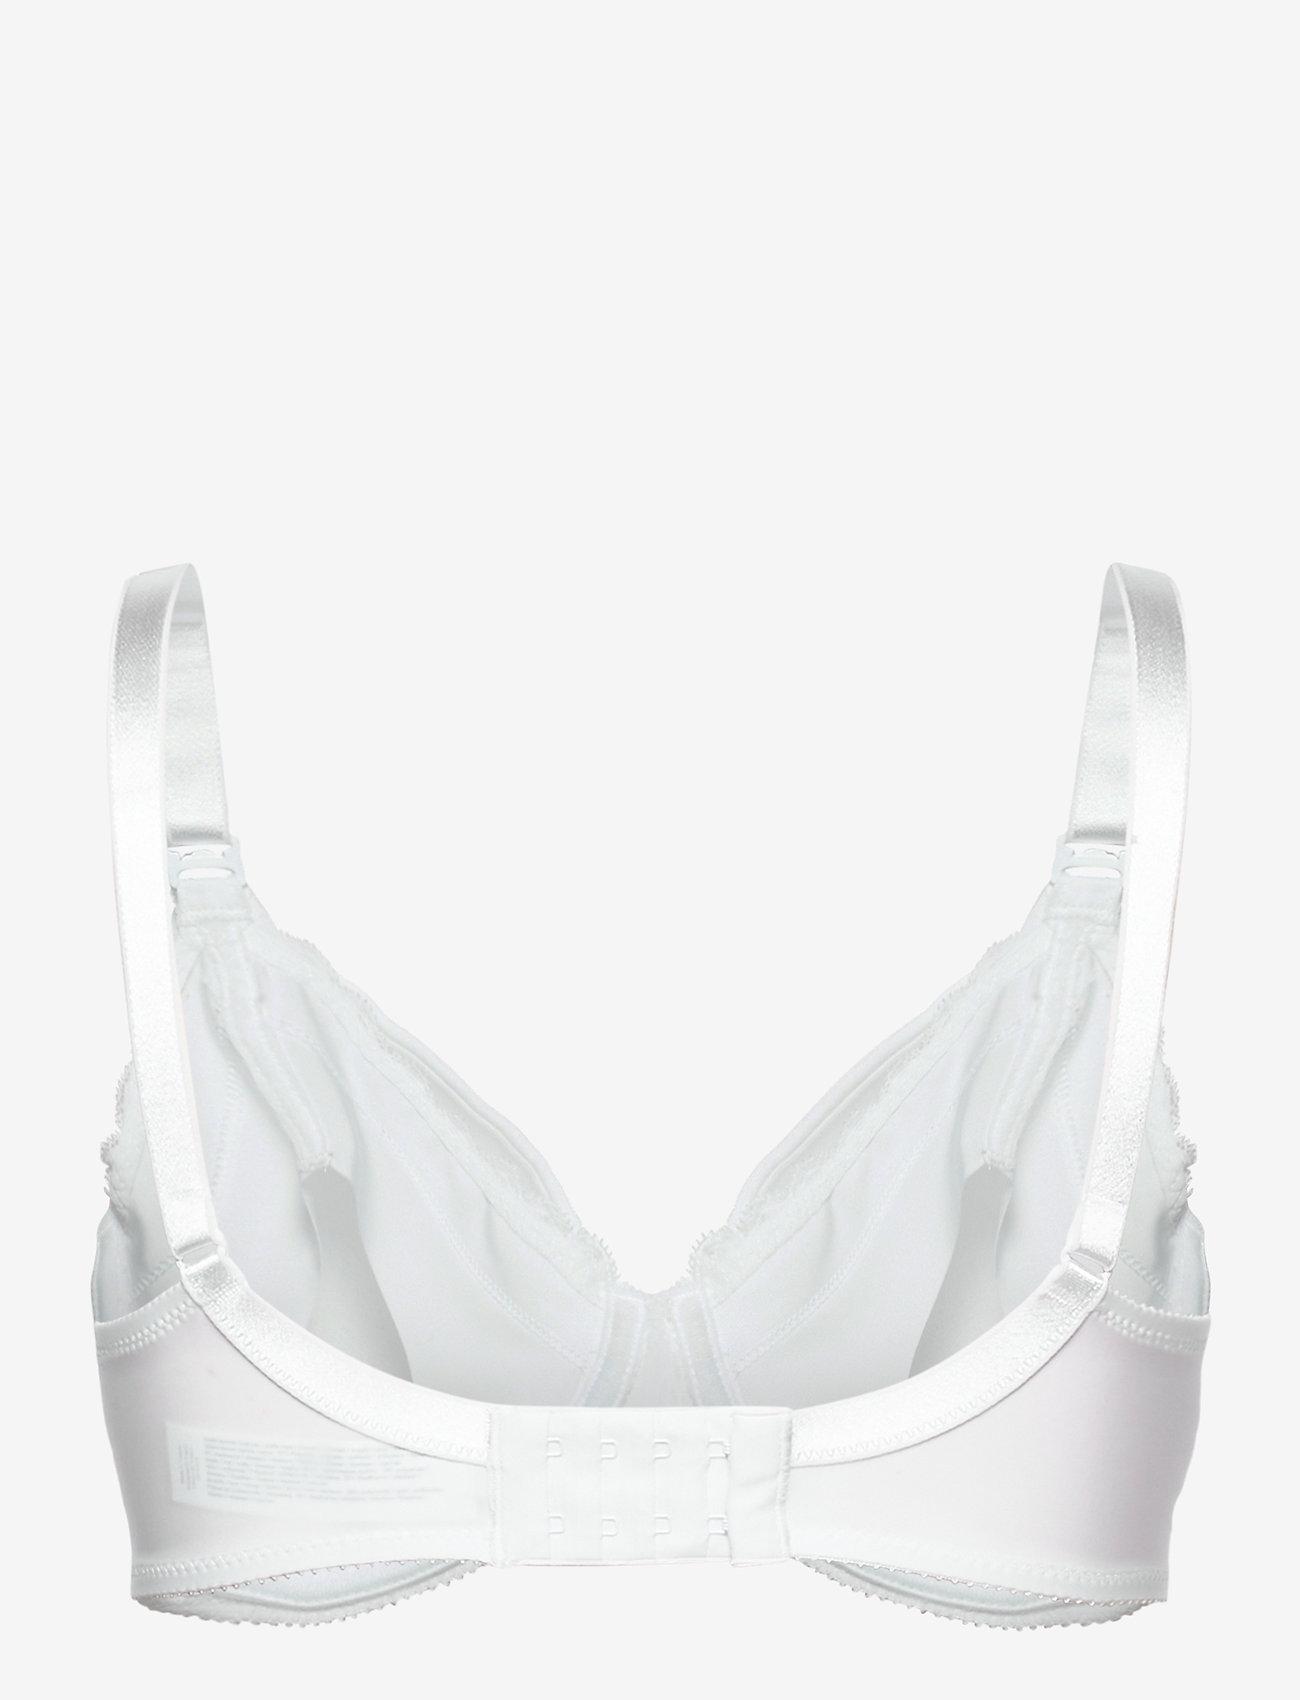 CHANTELLE - CO BRA SPE. MATERNITY - soutien-gorge emboîtant - white - 1